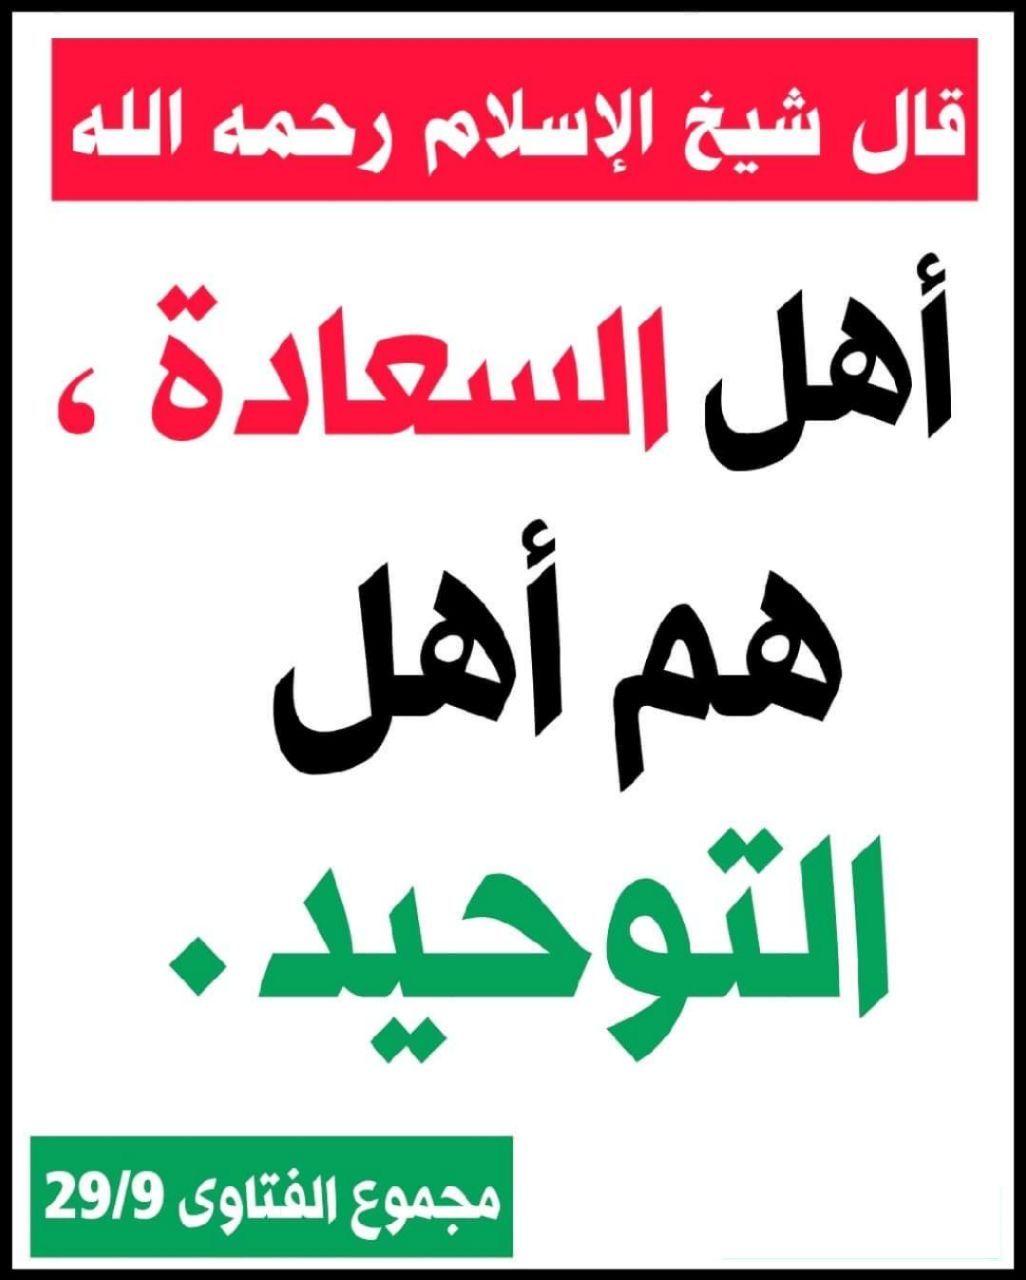 Pin By الأثر الجميل On أقوال الصحابة والعلماء Arabic Arabic Calligraphy Scholar